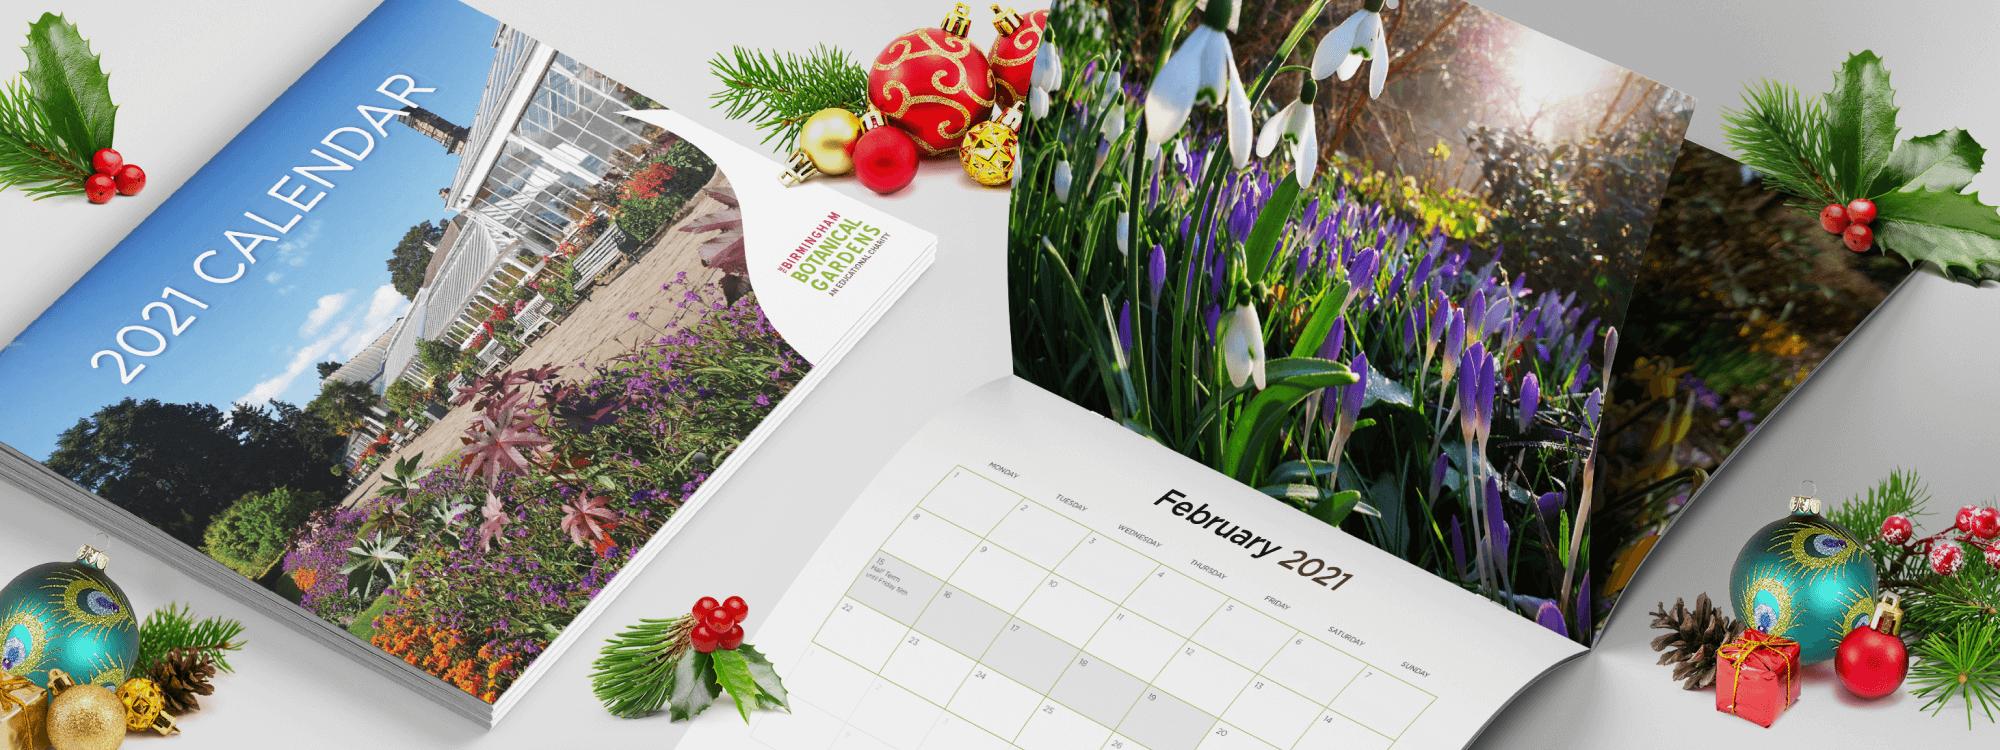 Birmingham Botanical Gardens 2021 Calendar